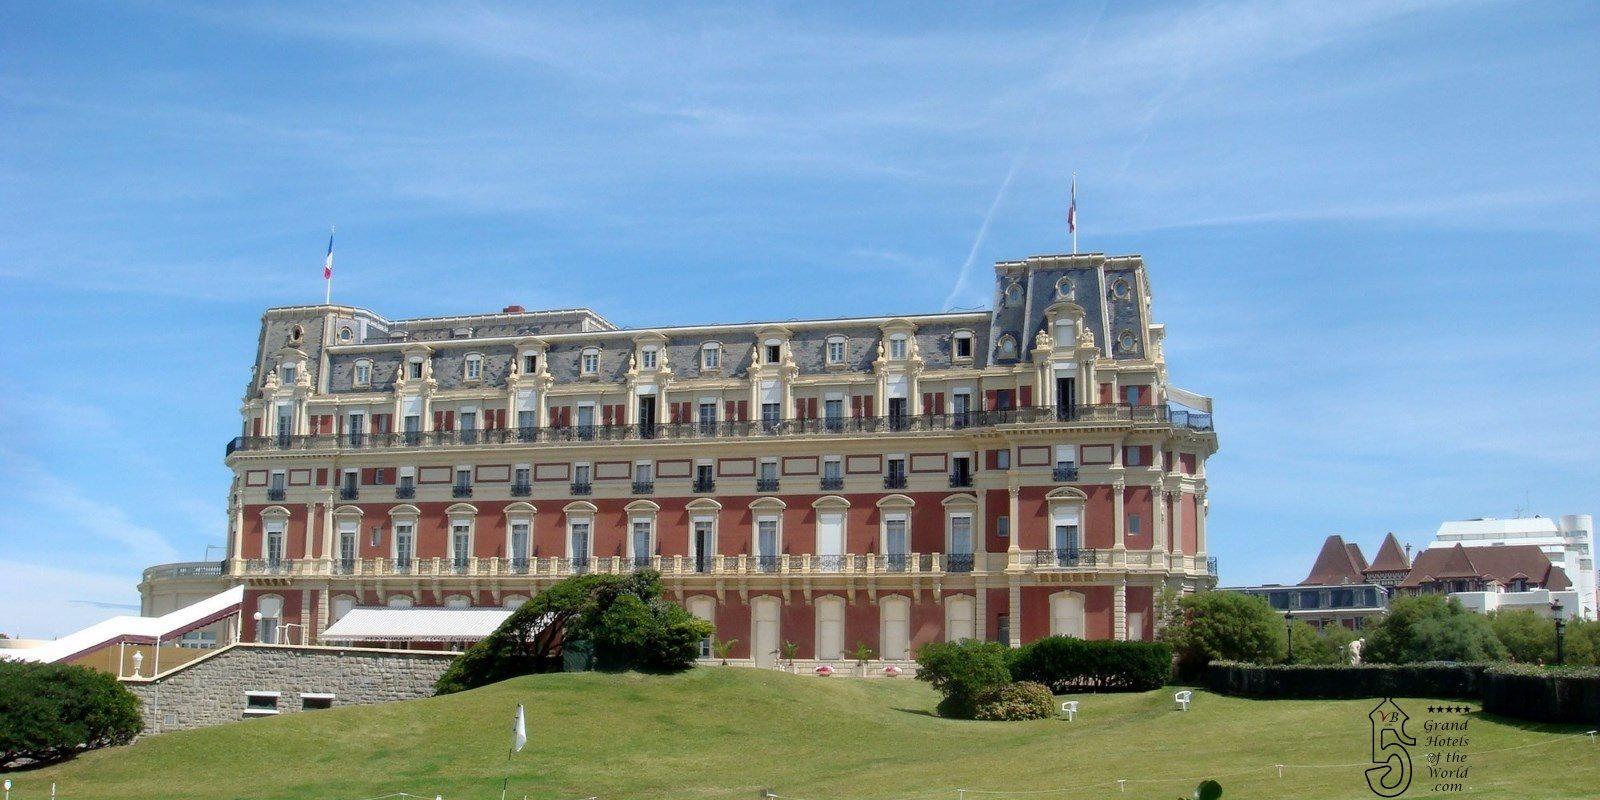 Hotel Du Grand Palais